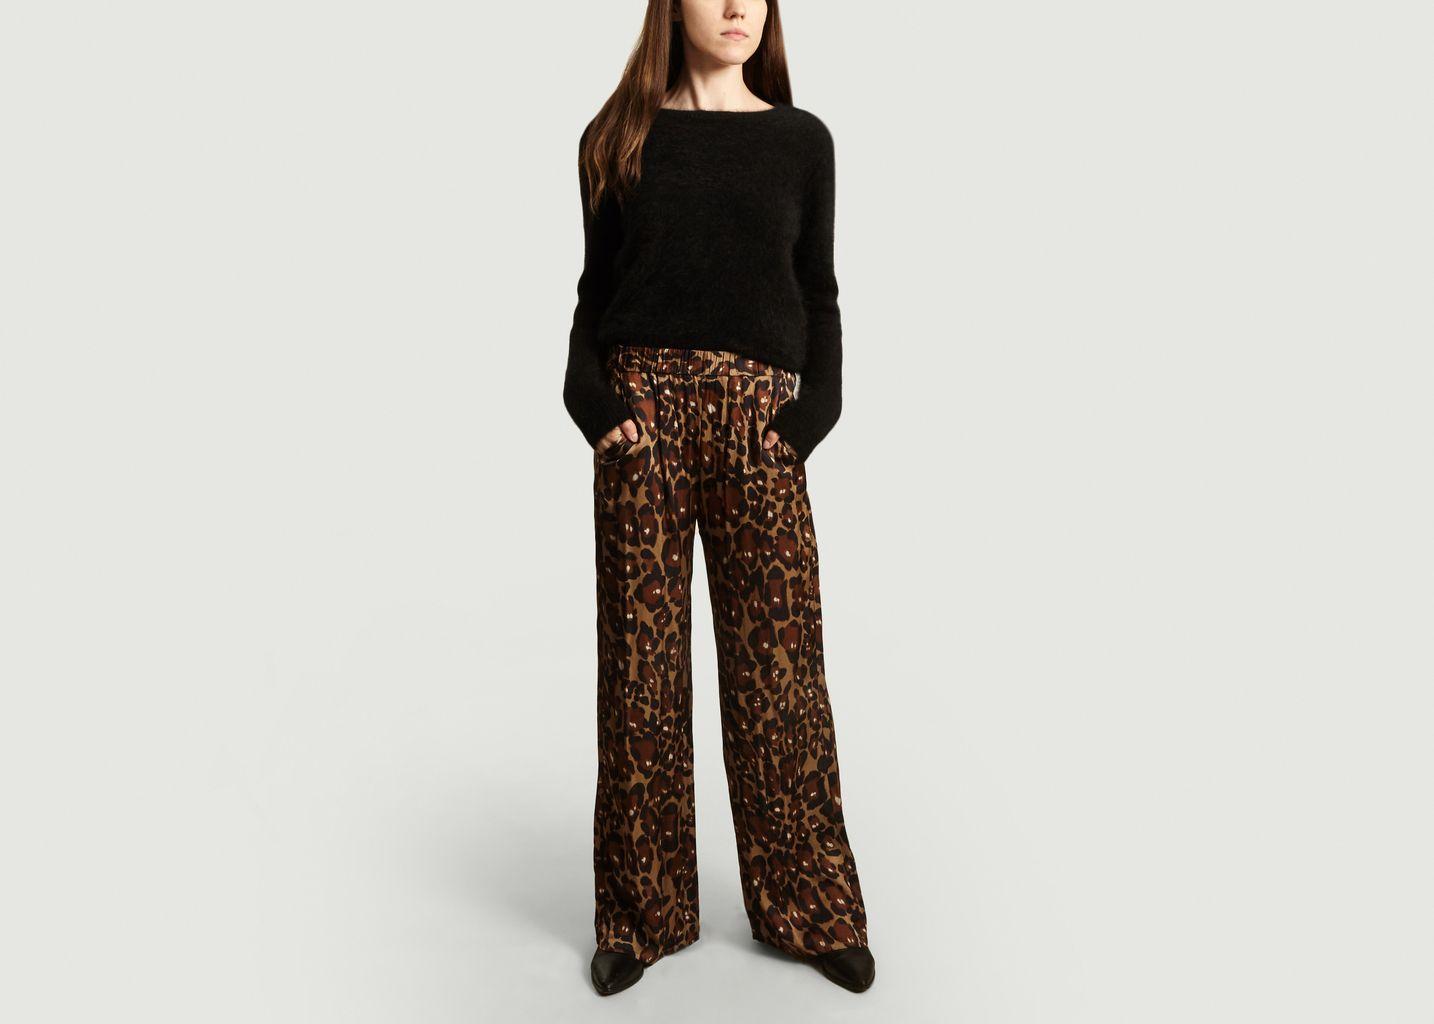 Pantalon Portorico imprimé léopard - Diega